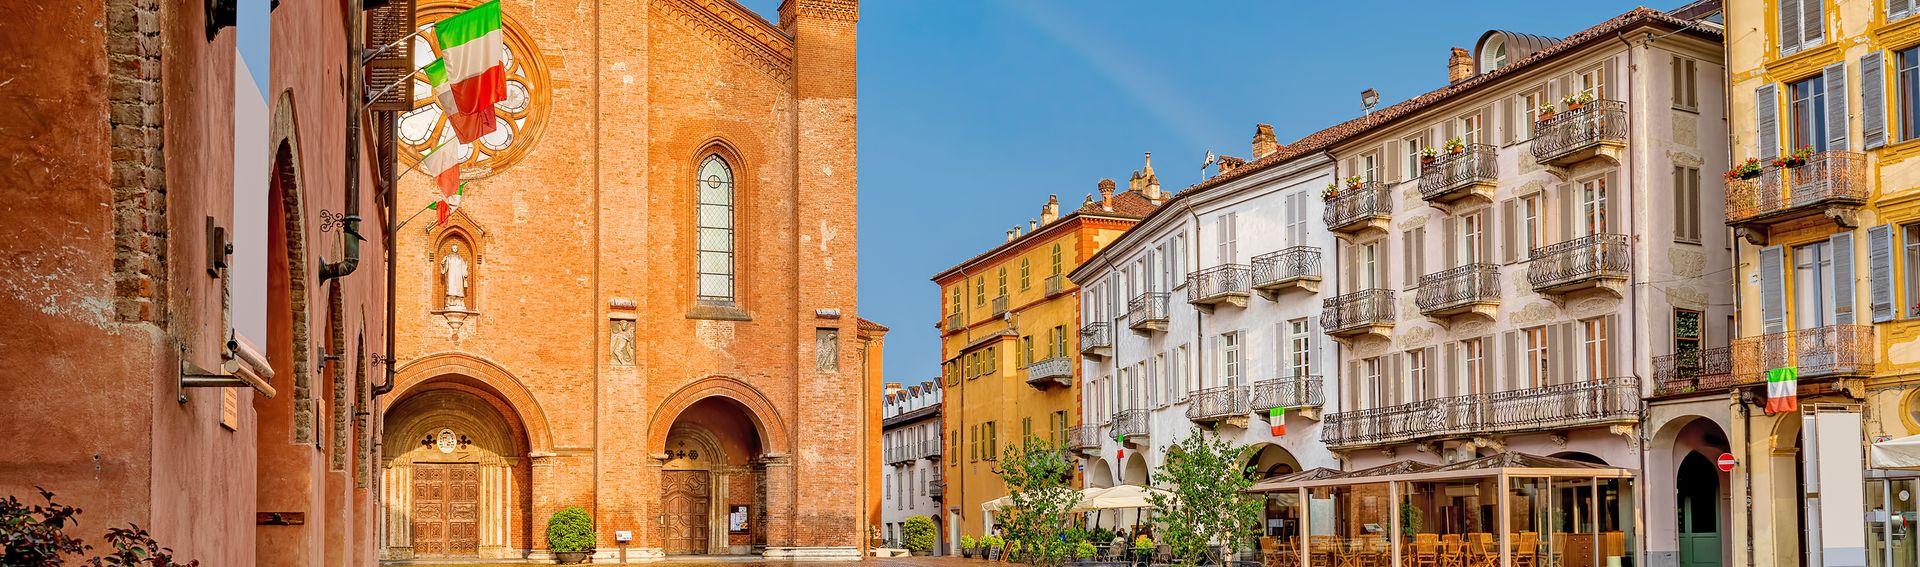 Provinz Cuneo